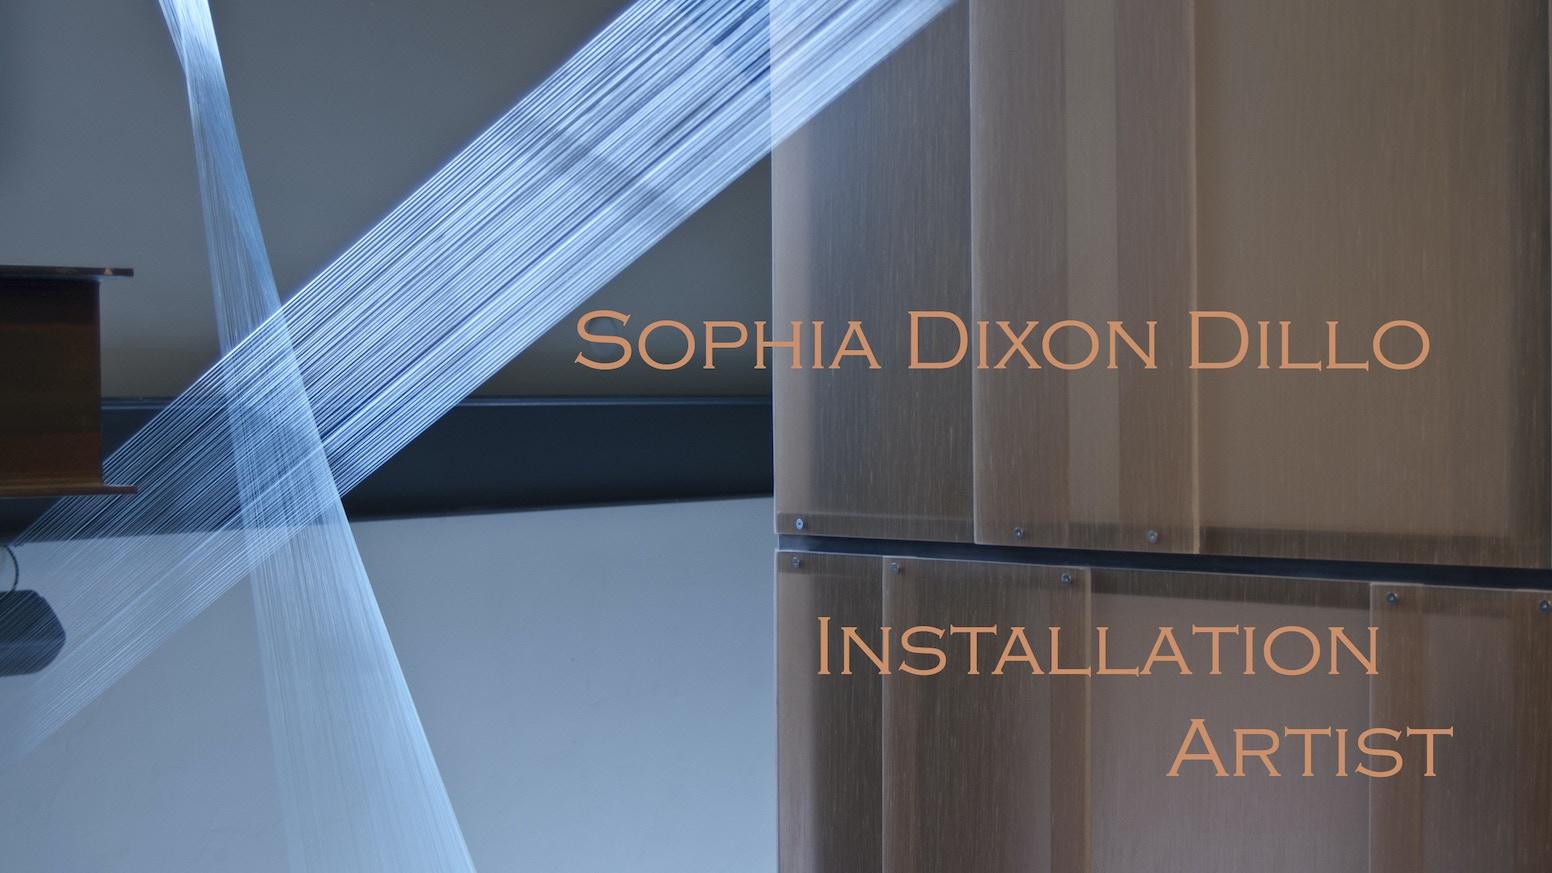 Light and Line Installation by Sophia Dixon Dillo — Kickstarter